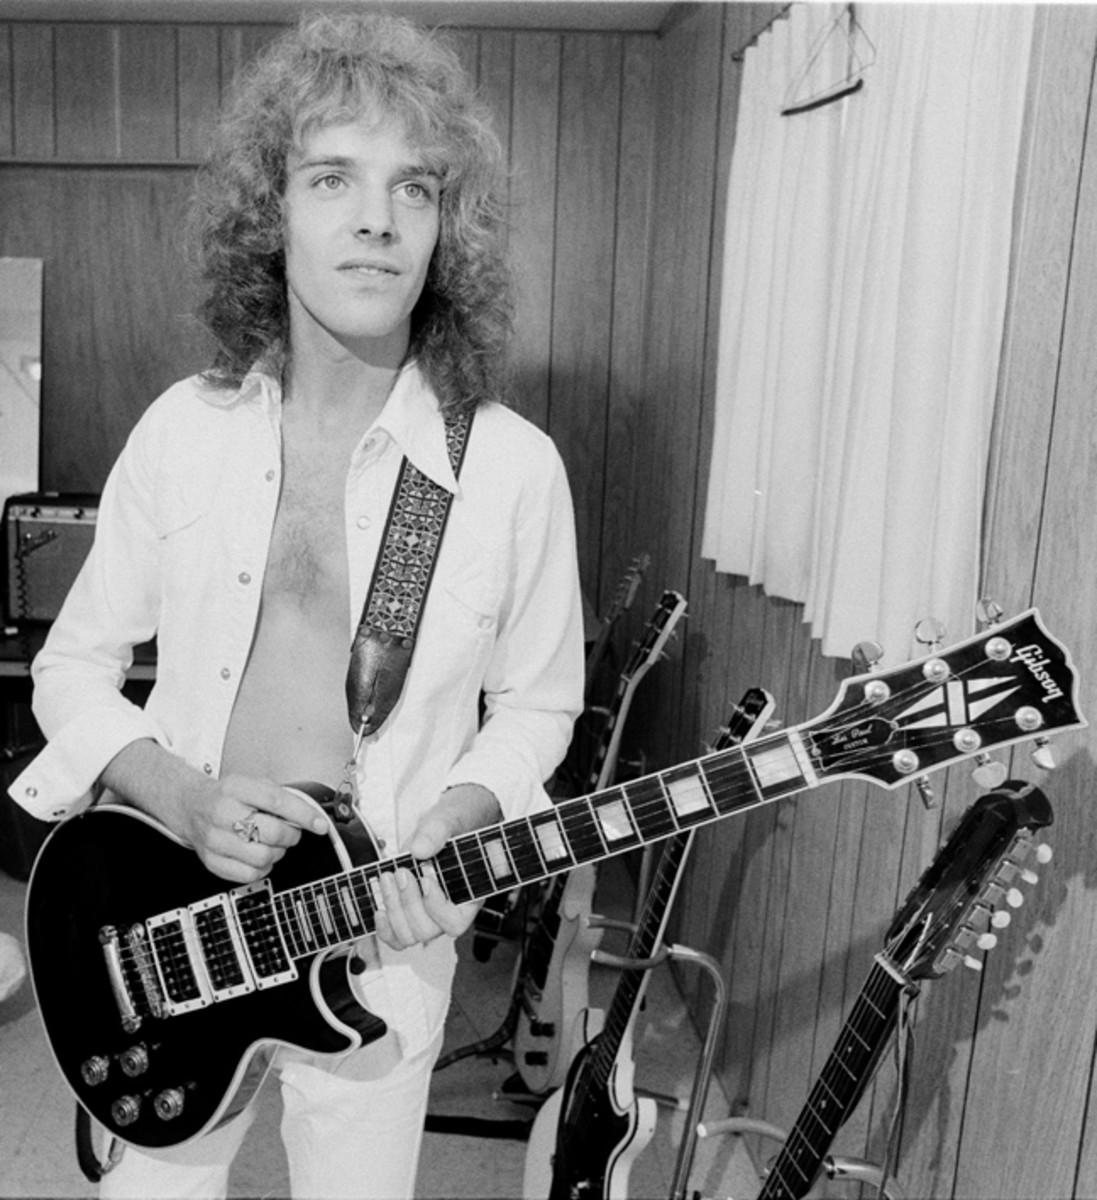 Peter Frampton 1970s